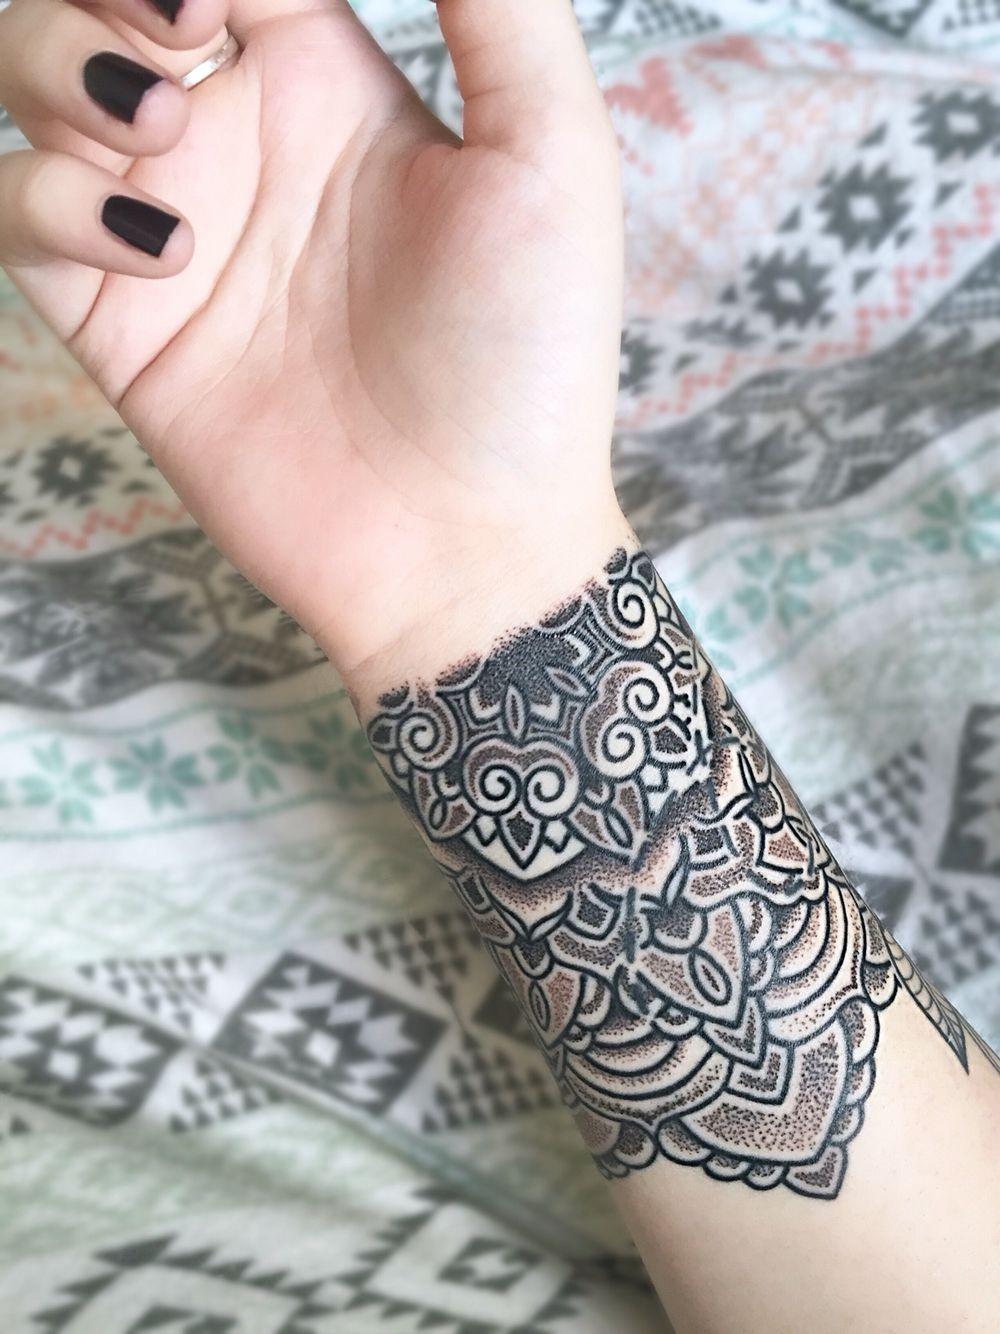 Mandala tattoo on pinterest lotus mandala tattoo lotus mandala - Mandala Wrist Tattoo Artist Matt Stopps At One By One Tattoo Studio In Soho